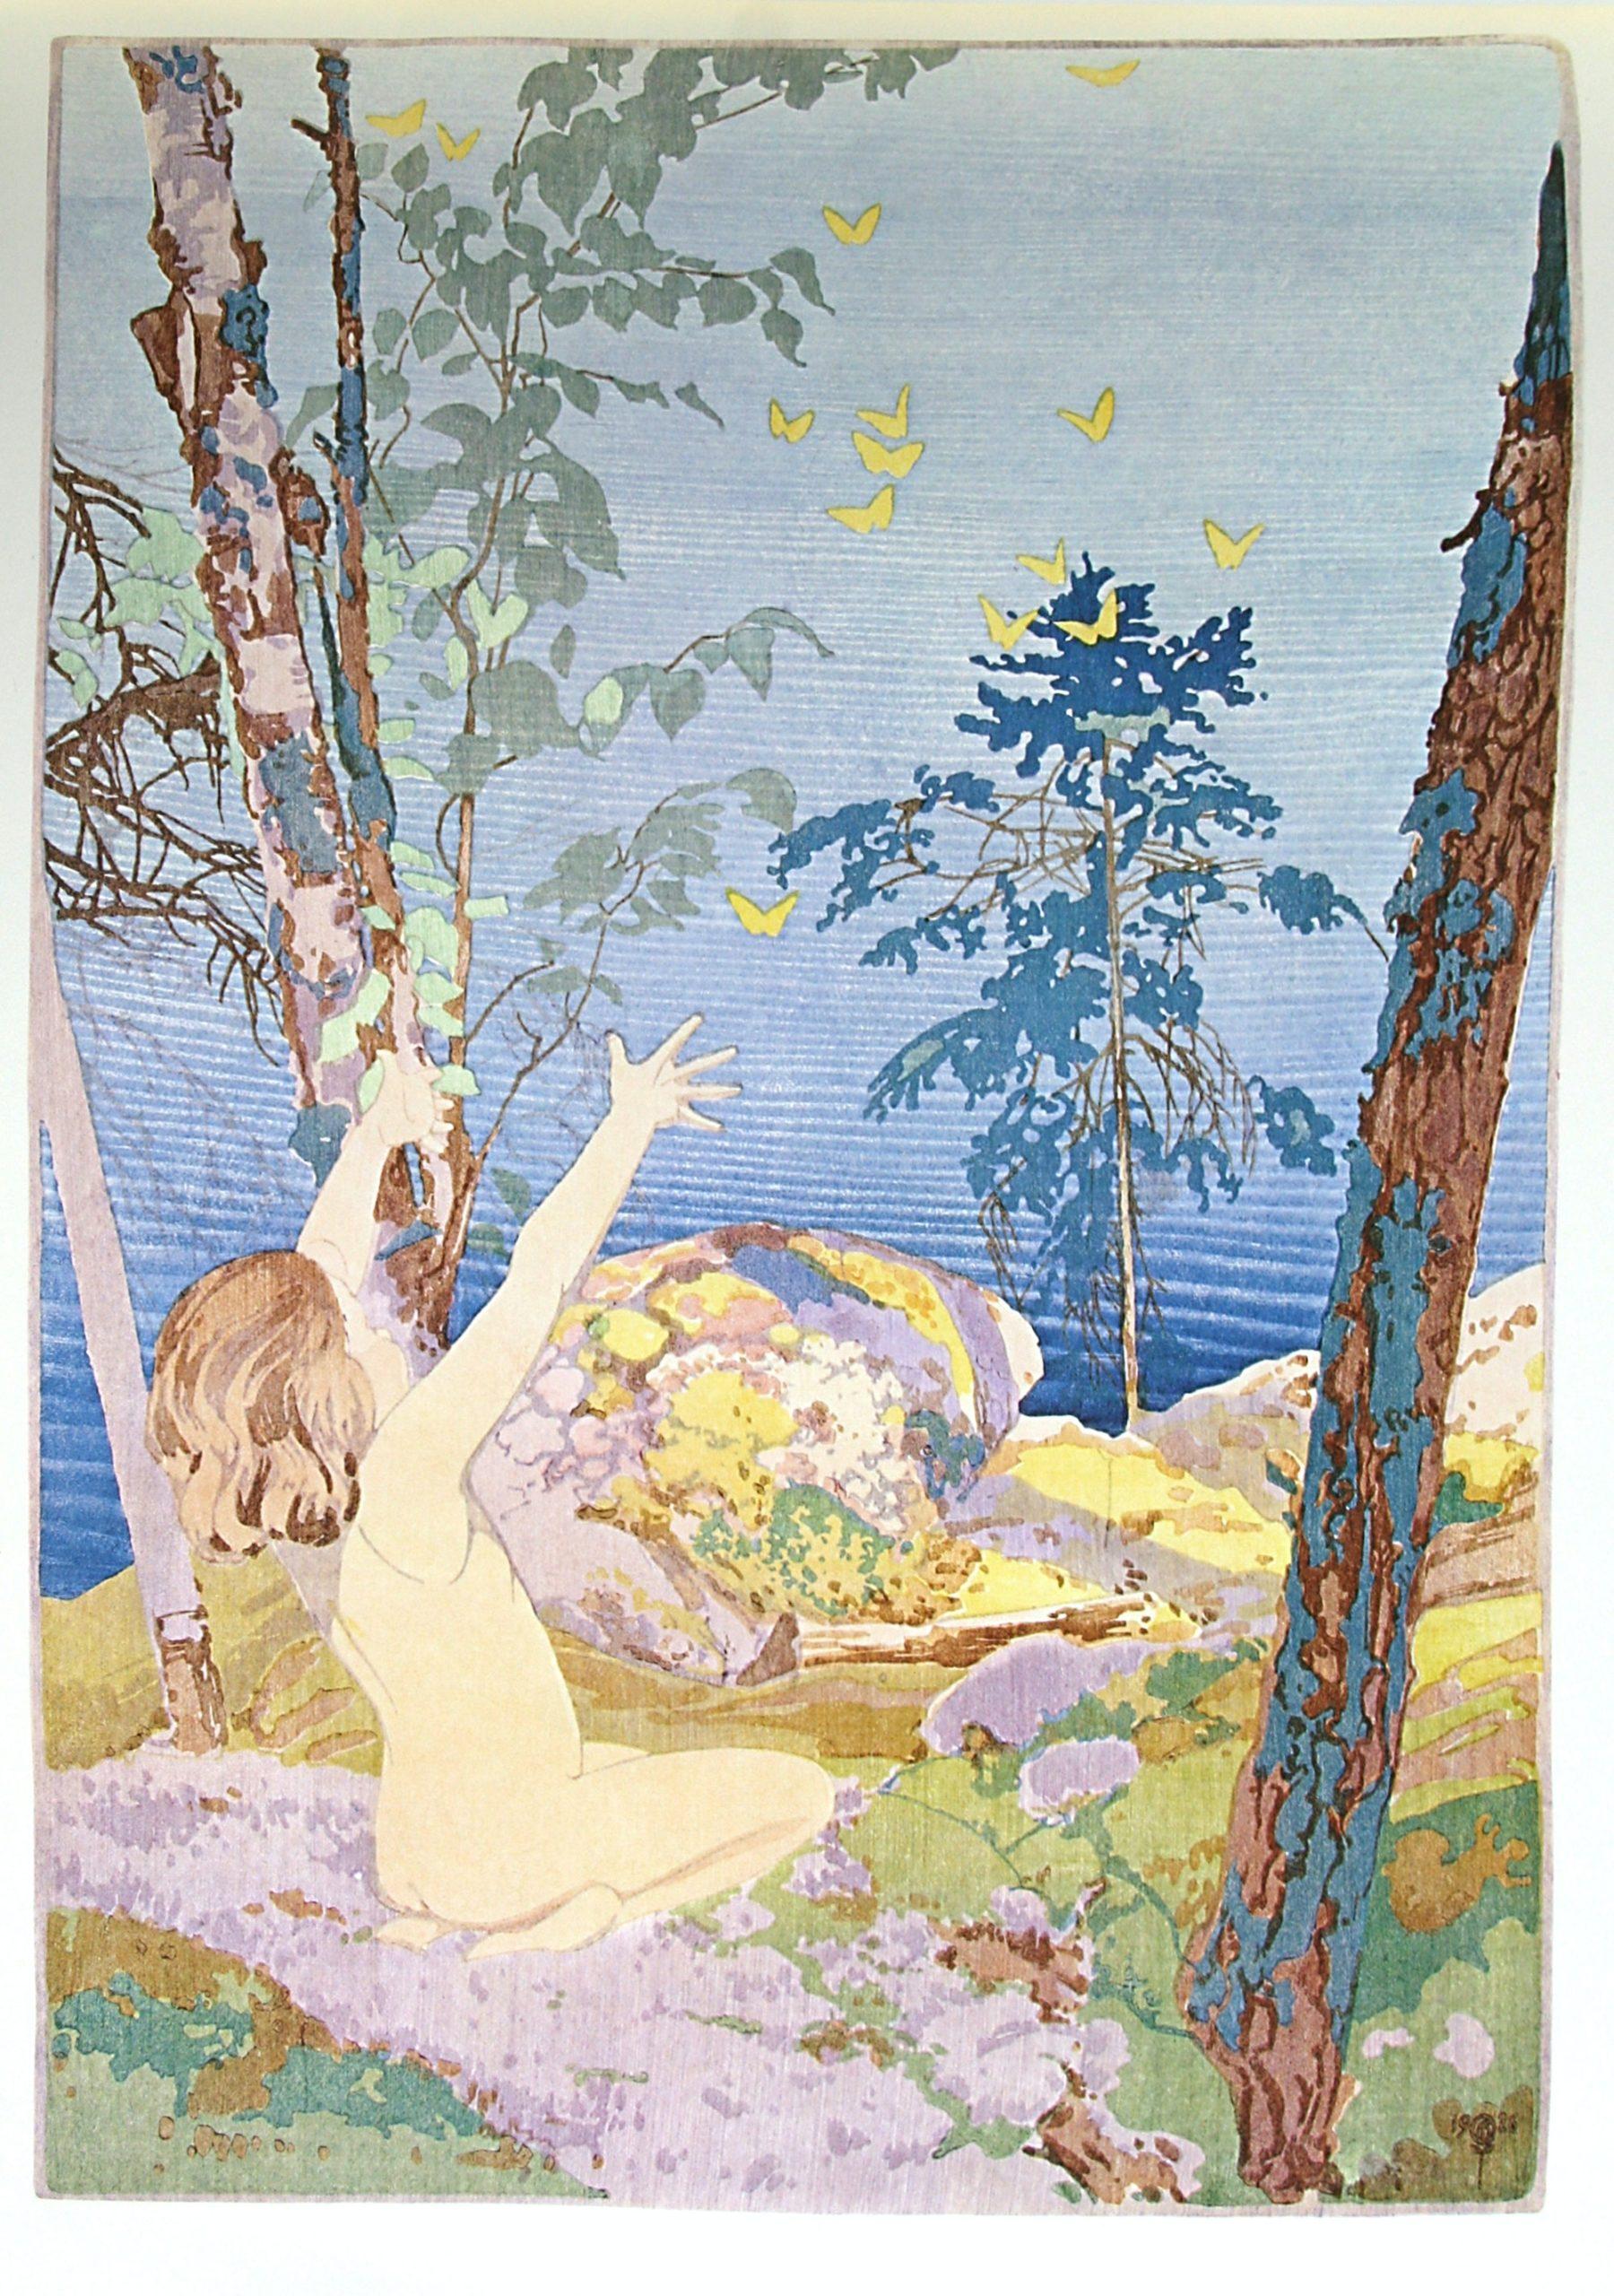 Summer Idyll by WJ Phillips